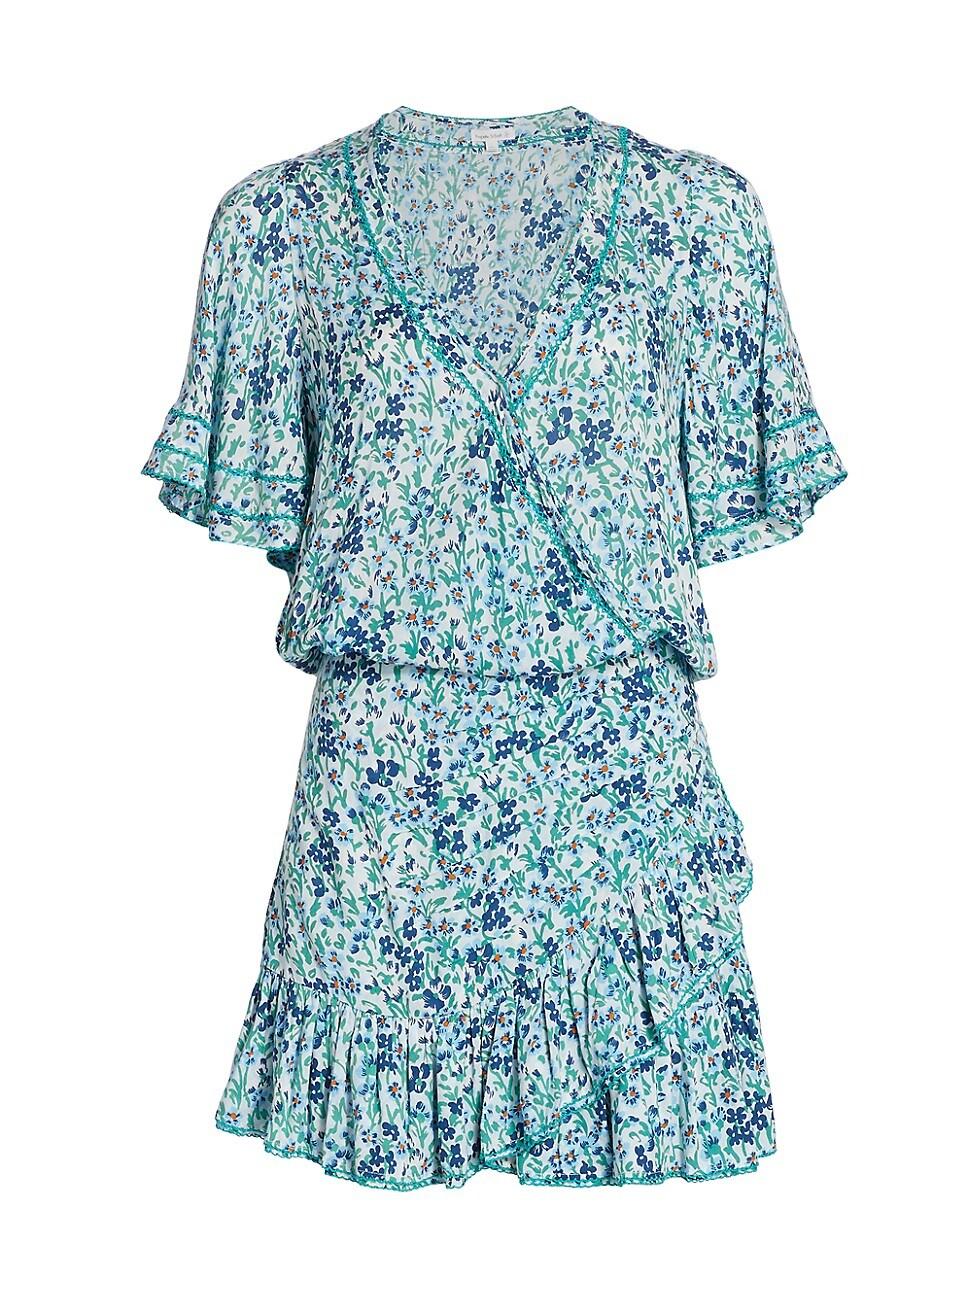 Poupette St Barth WOMEN'S MABELLE RUFFLE FLORAL MINI A-LINE DRESS